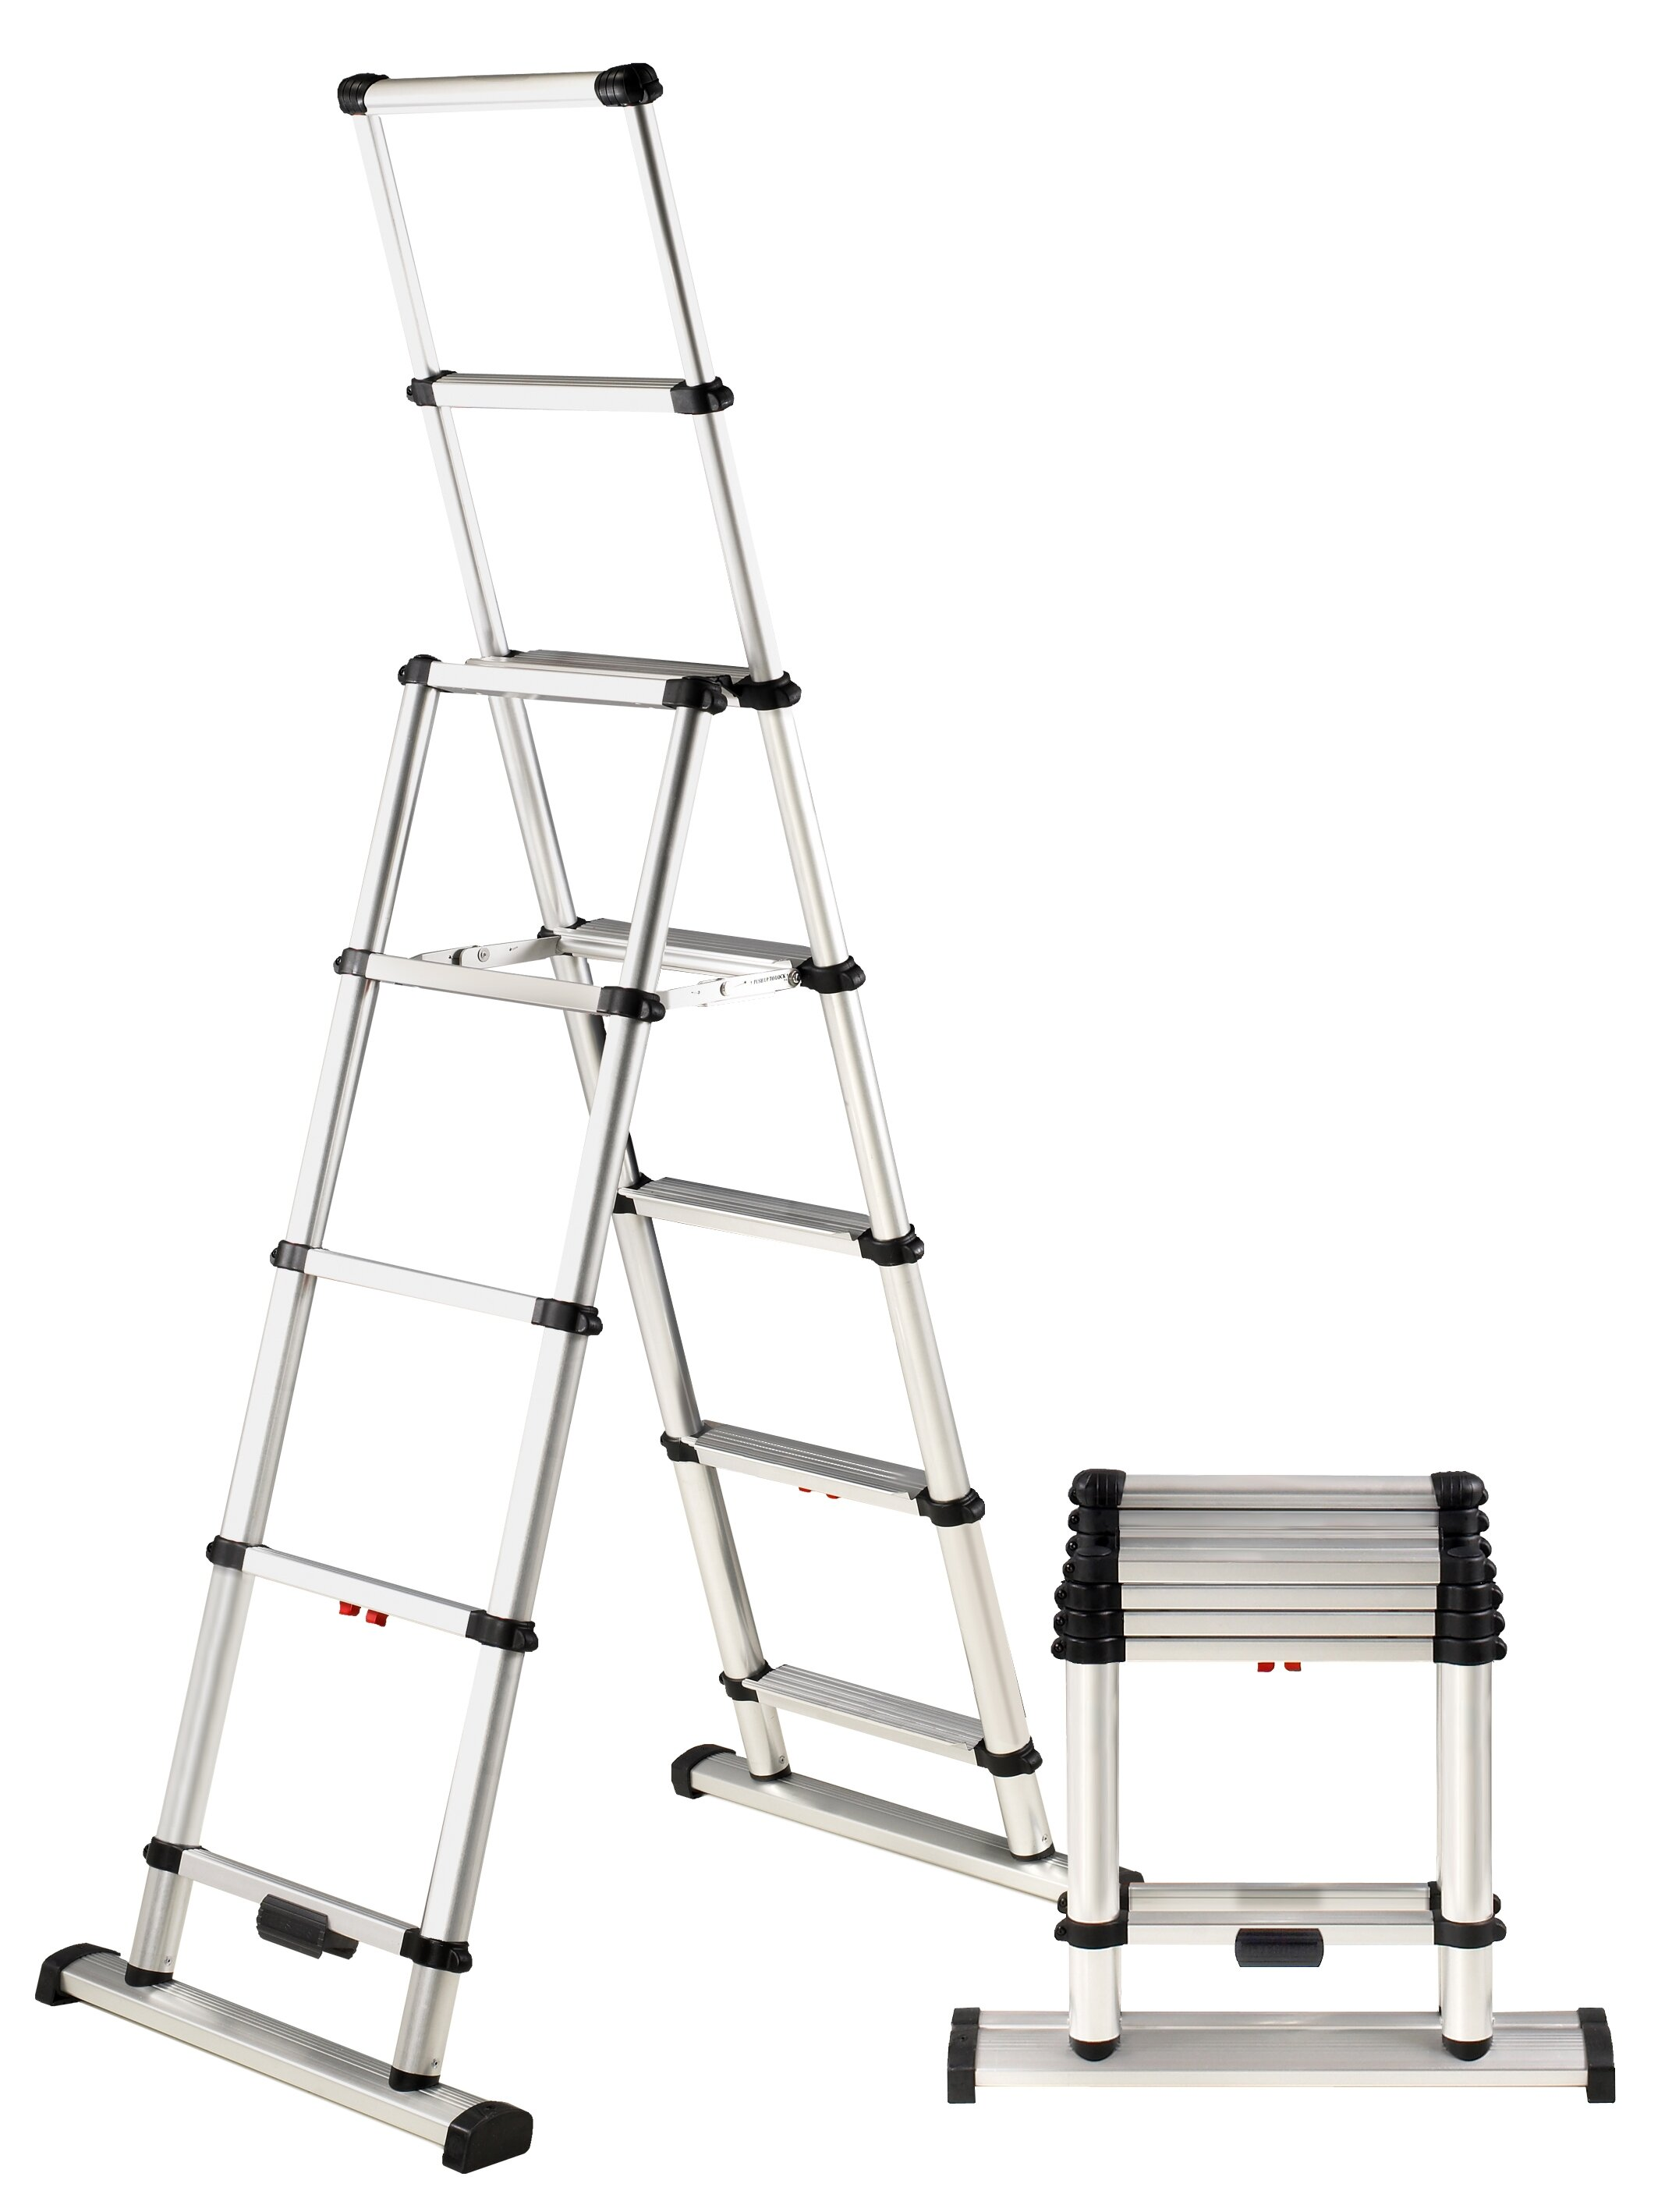 Telesteps Combination 10 Ft Aluminum Step Ladder With 375 Lb Load Capacity Wayfair